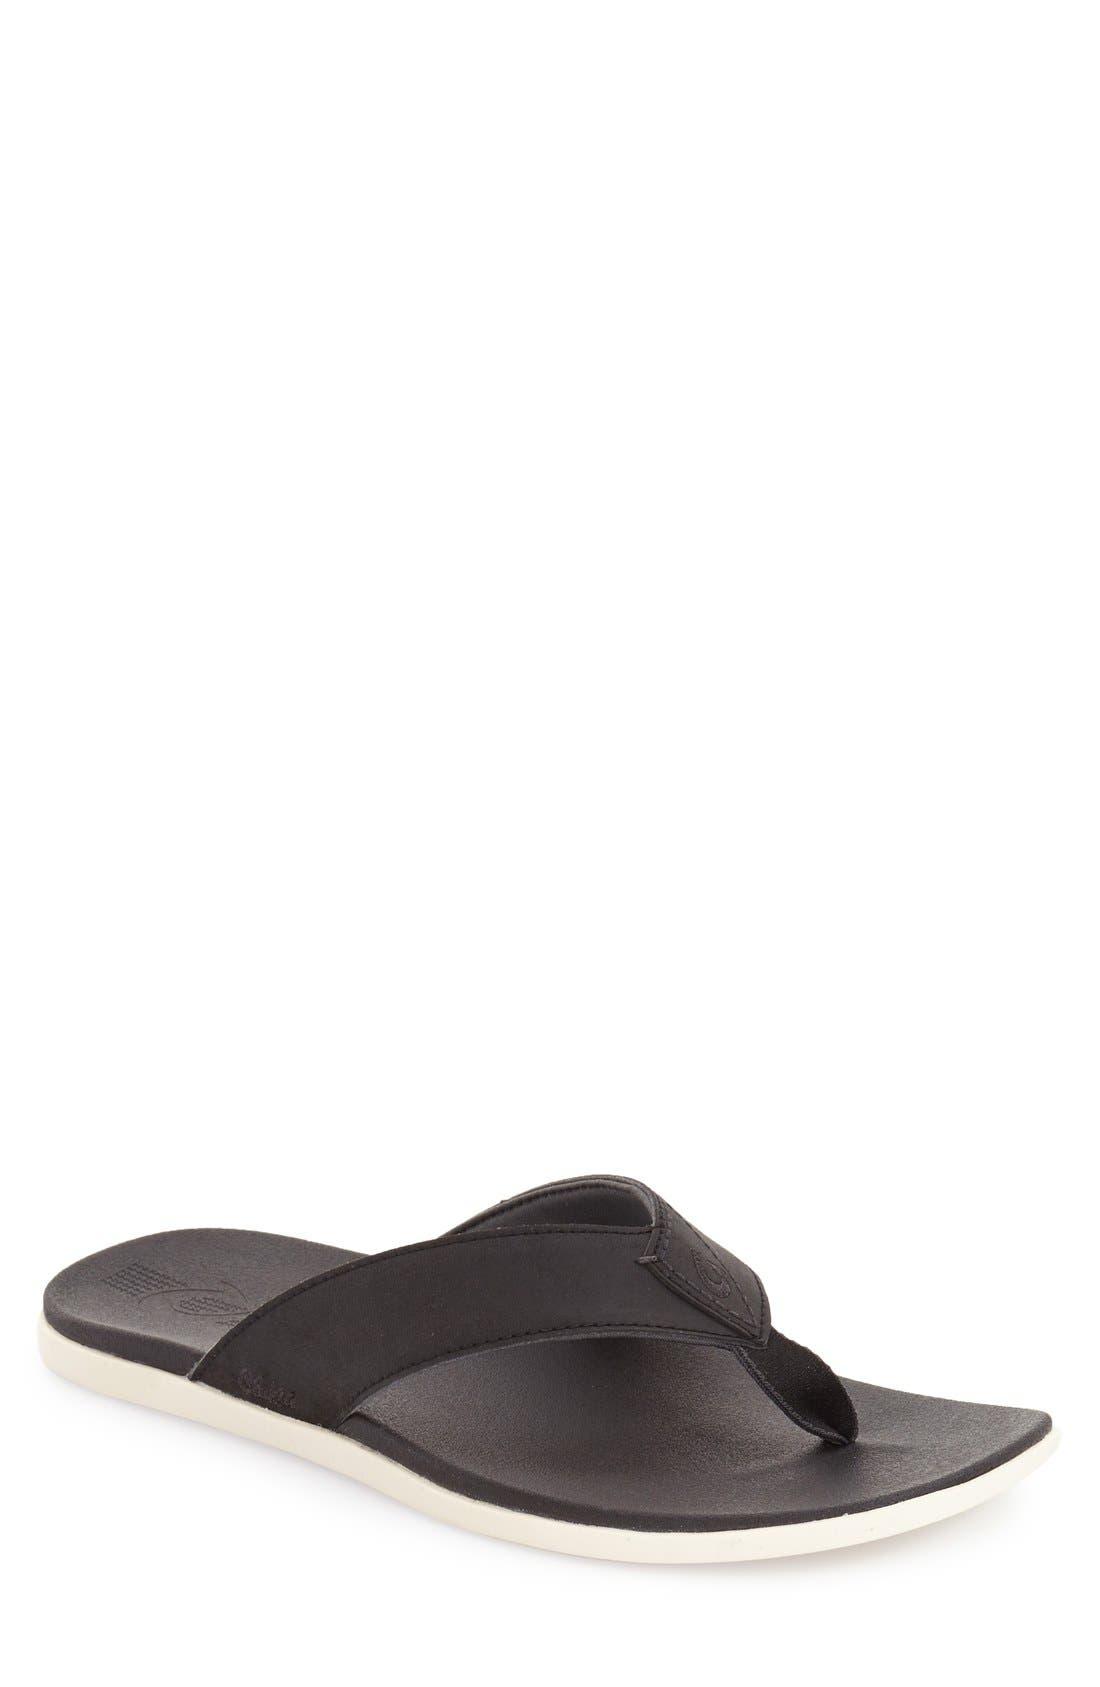 'Holona' Flip Flop,                         Main,                         color, BLACK/ BLACK